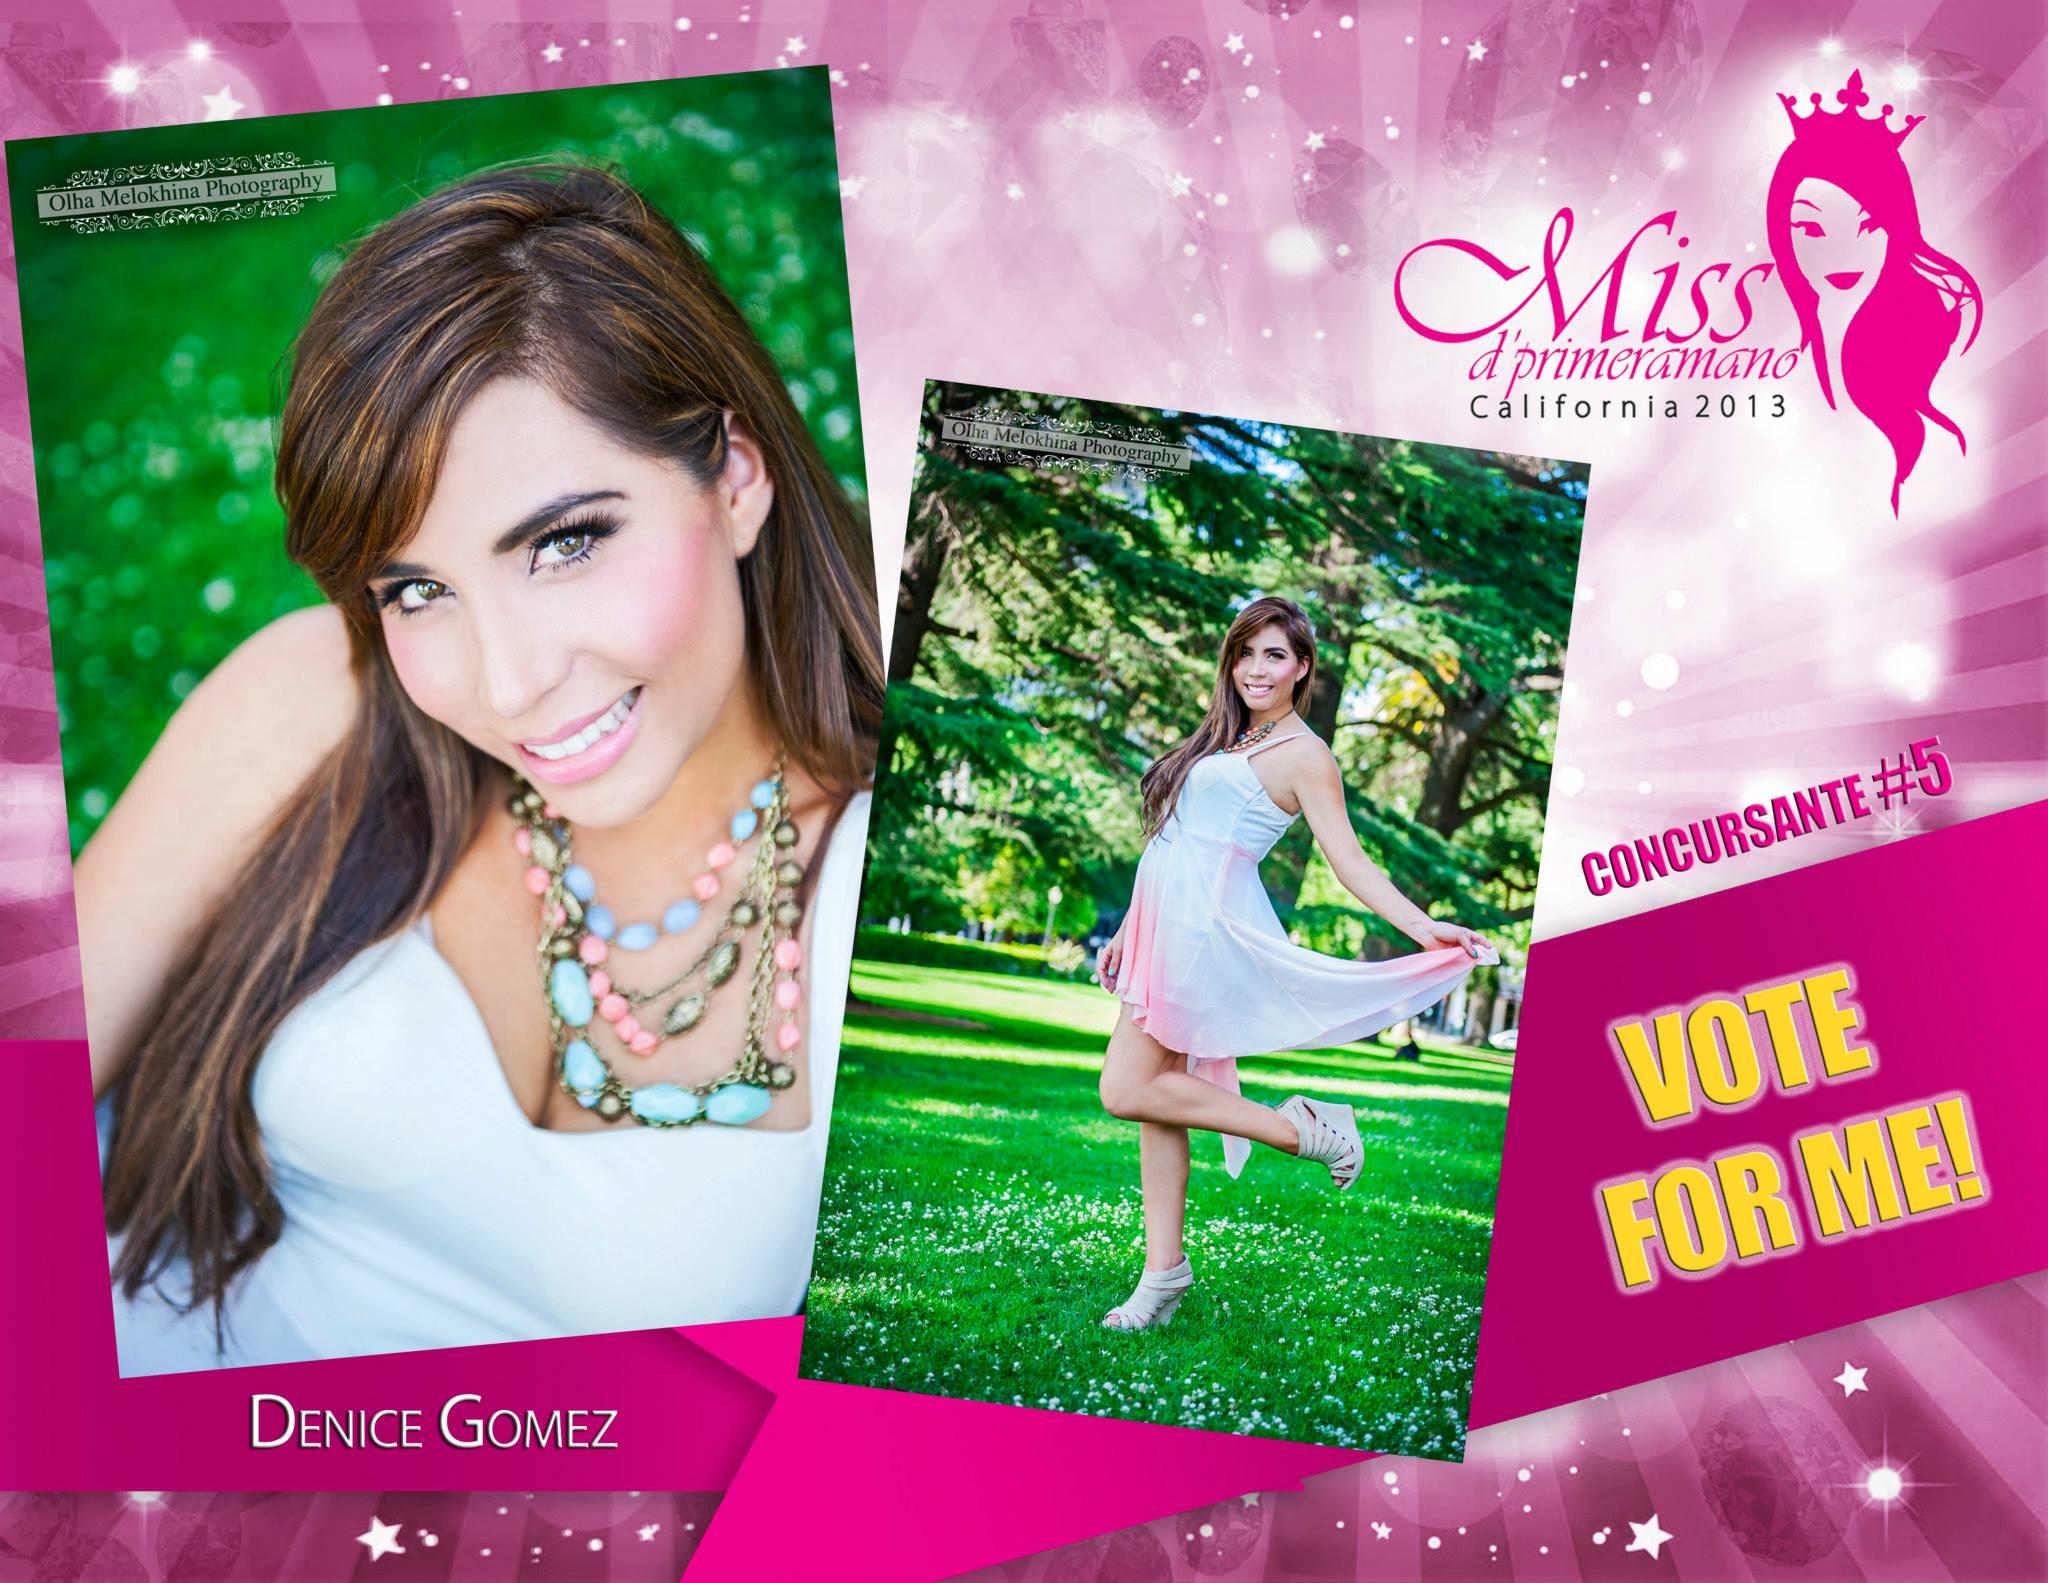 web vote poster for Miss Dprimeraman